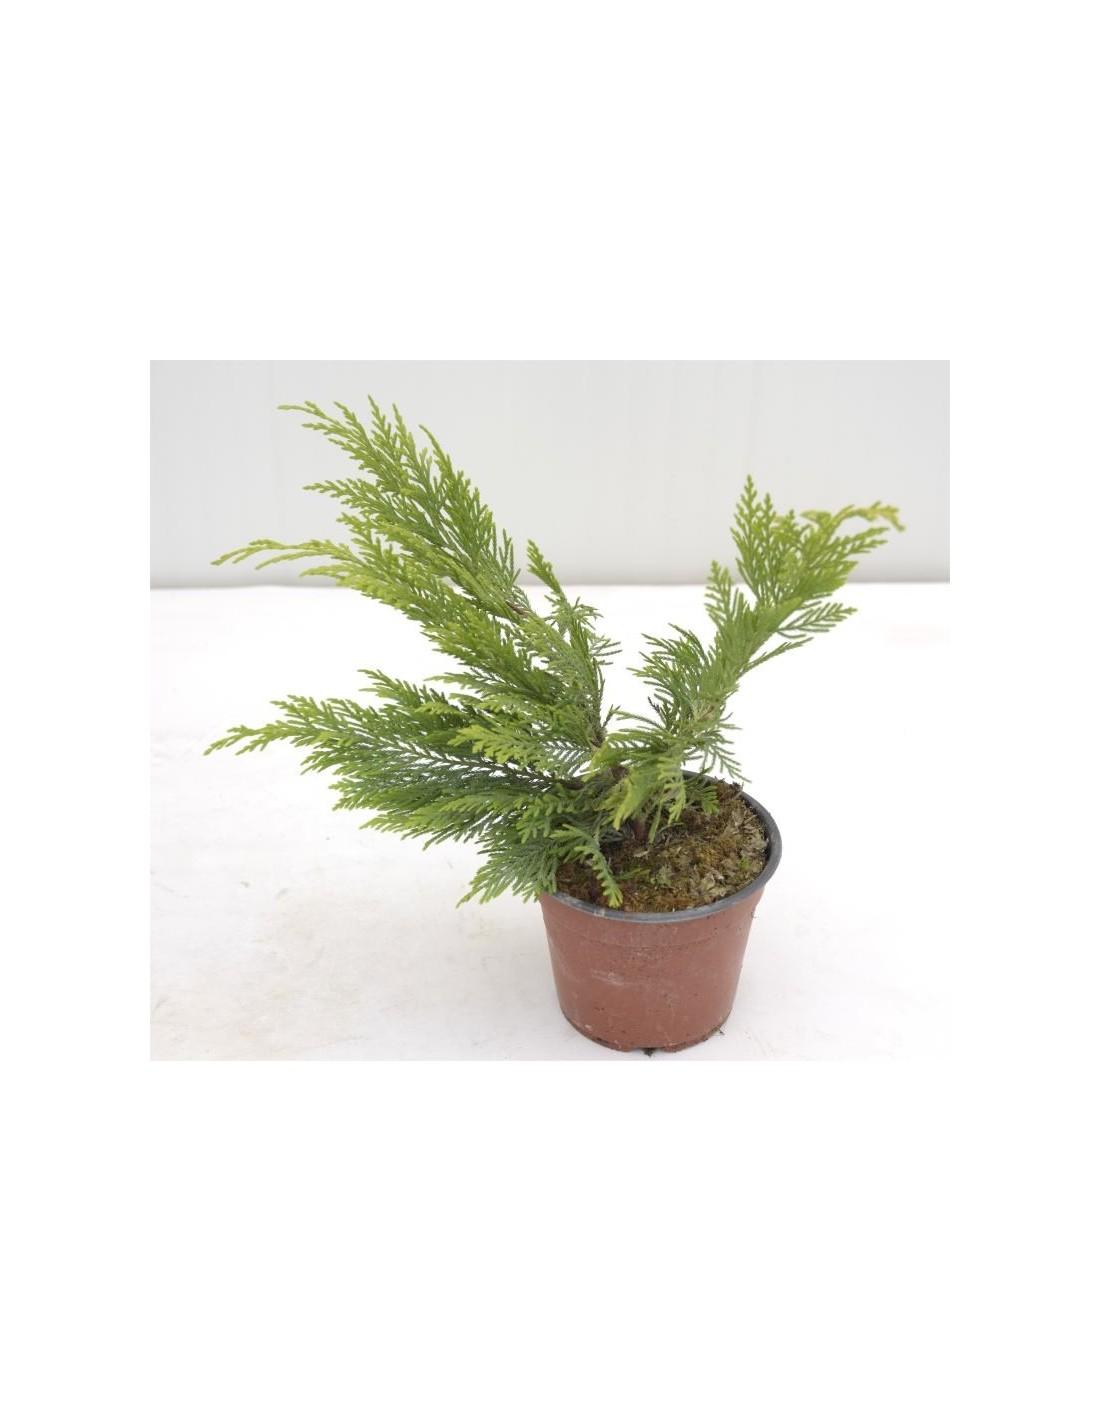 Piante Siepe Crescita Rapida vendita pianta cupressocyparis leylandii- piante da siepe|mondo piante